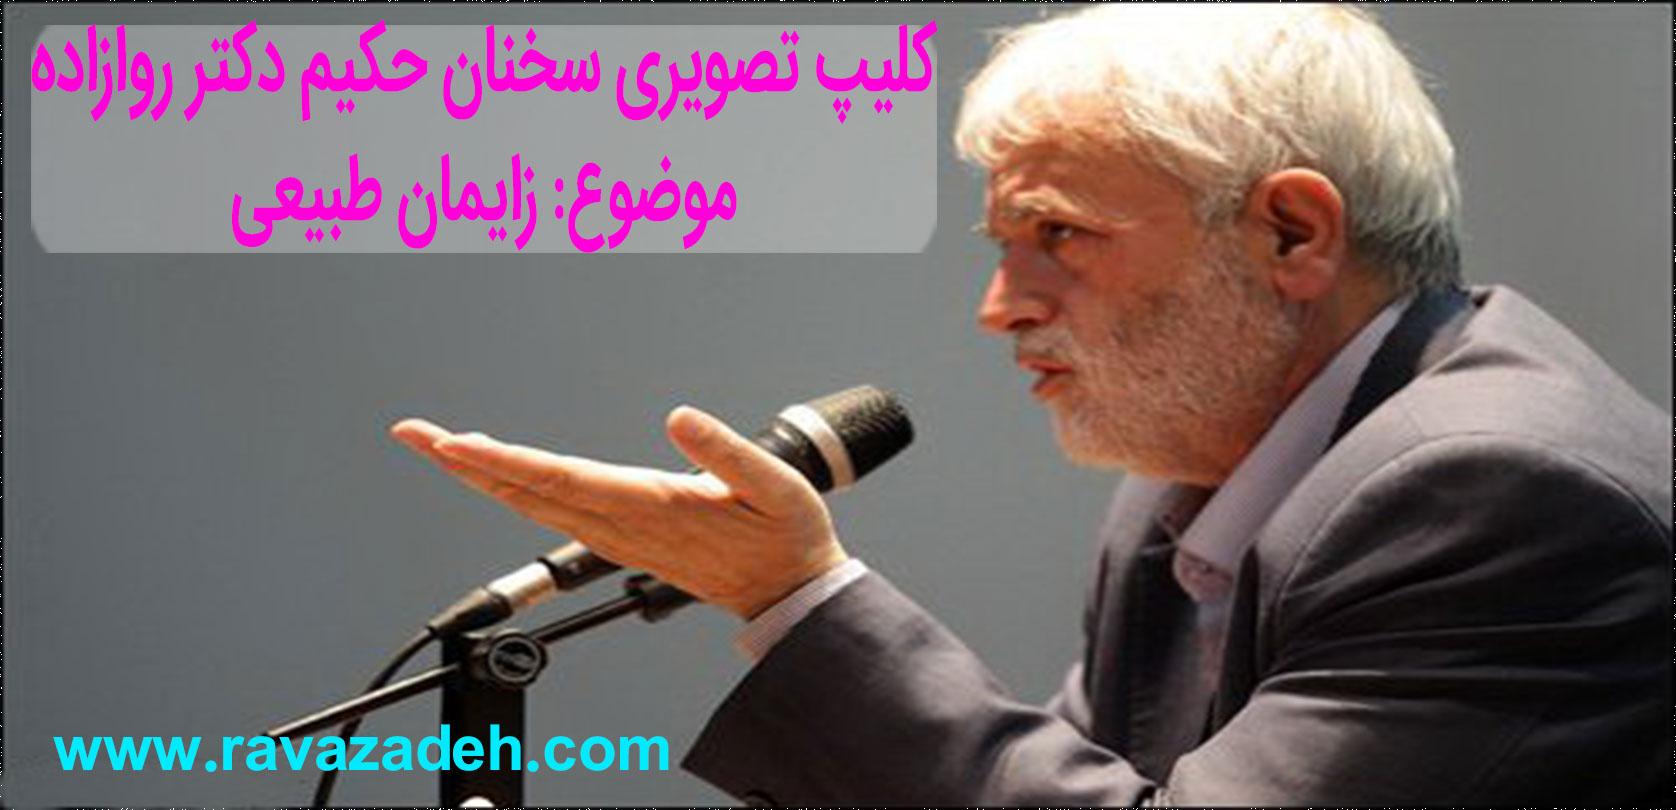 Photo of زایمان طبیعی + کلیپ تصویری سخنرانی حکیم دکتر روازاده